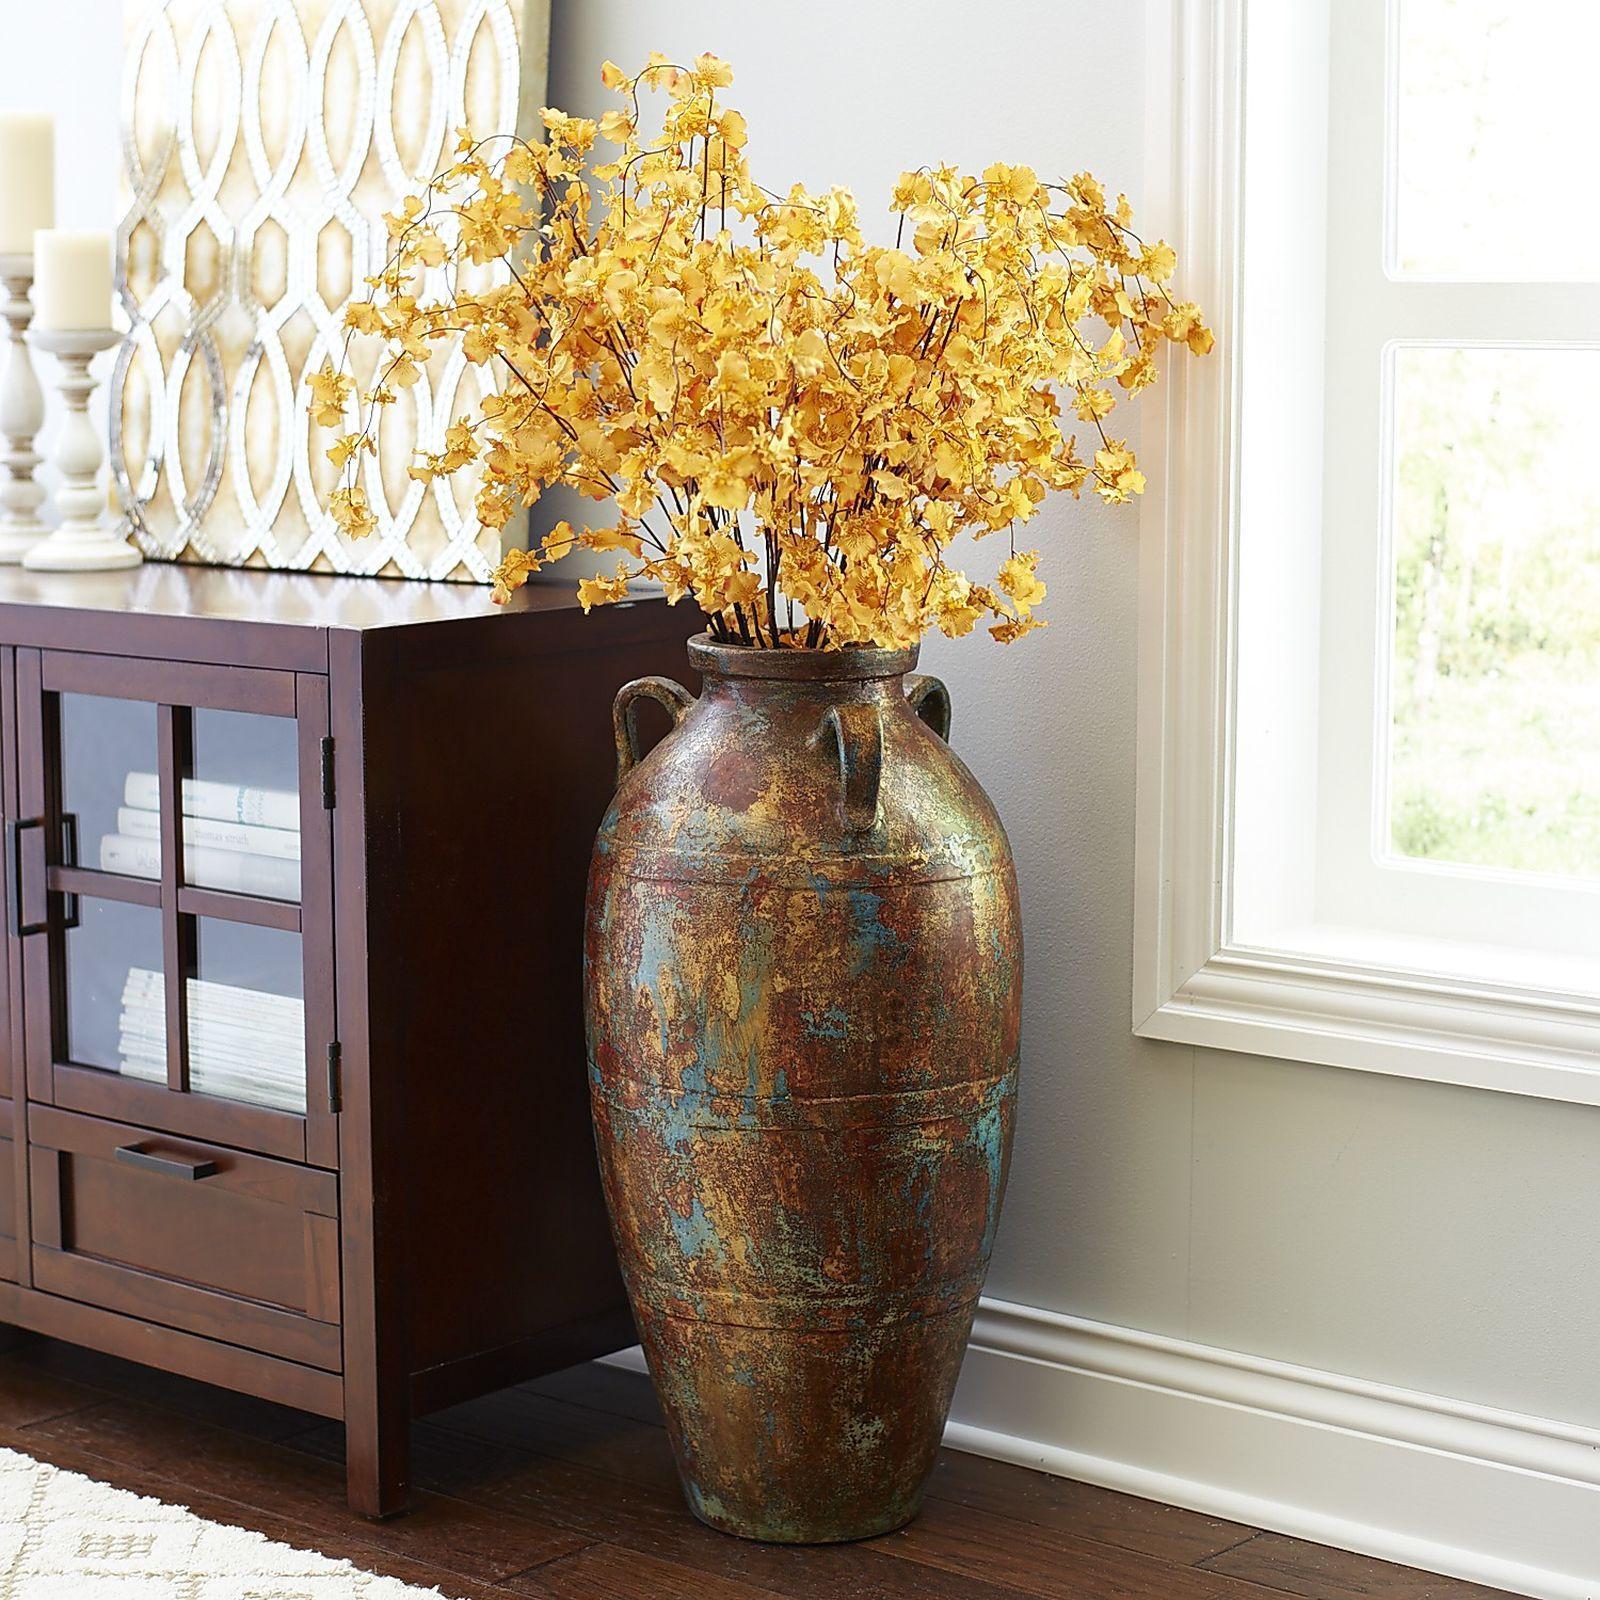 Terracotta Floor Vase Tall Vase Decor Large Floor Vase Floor